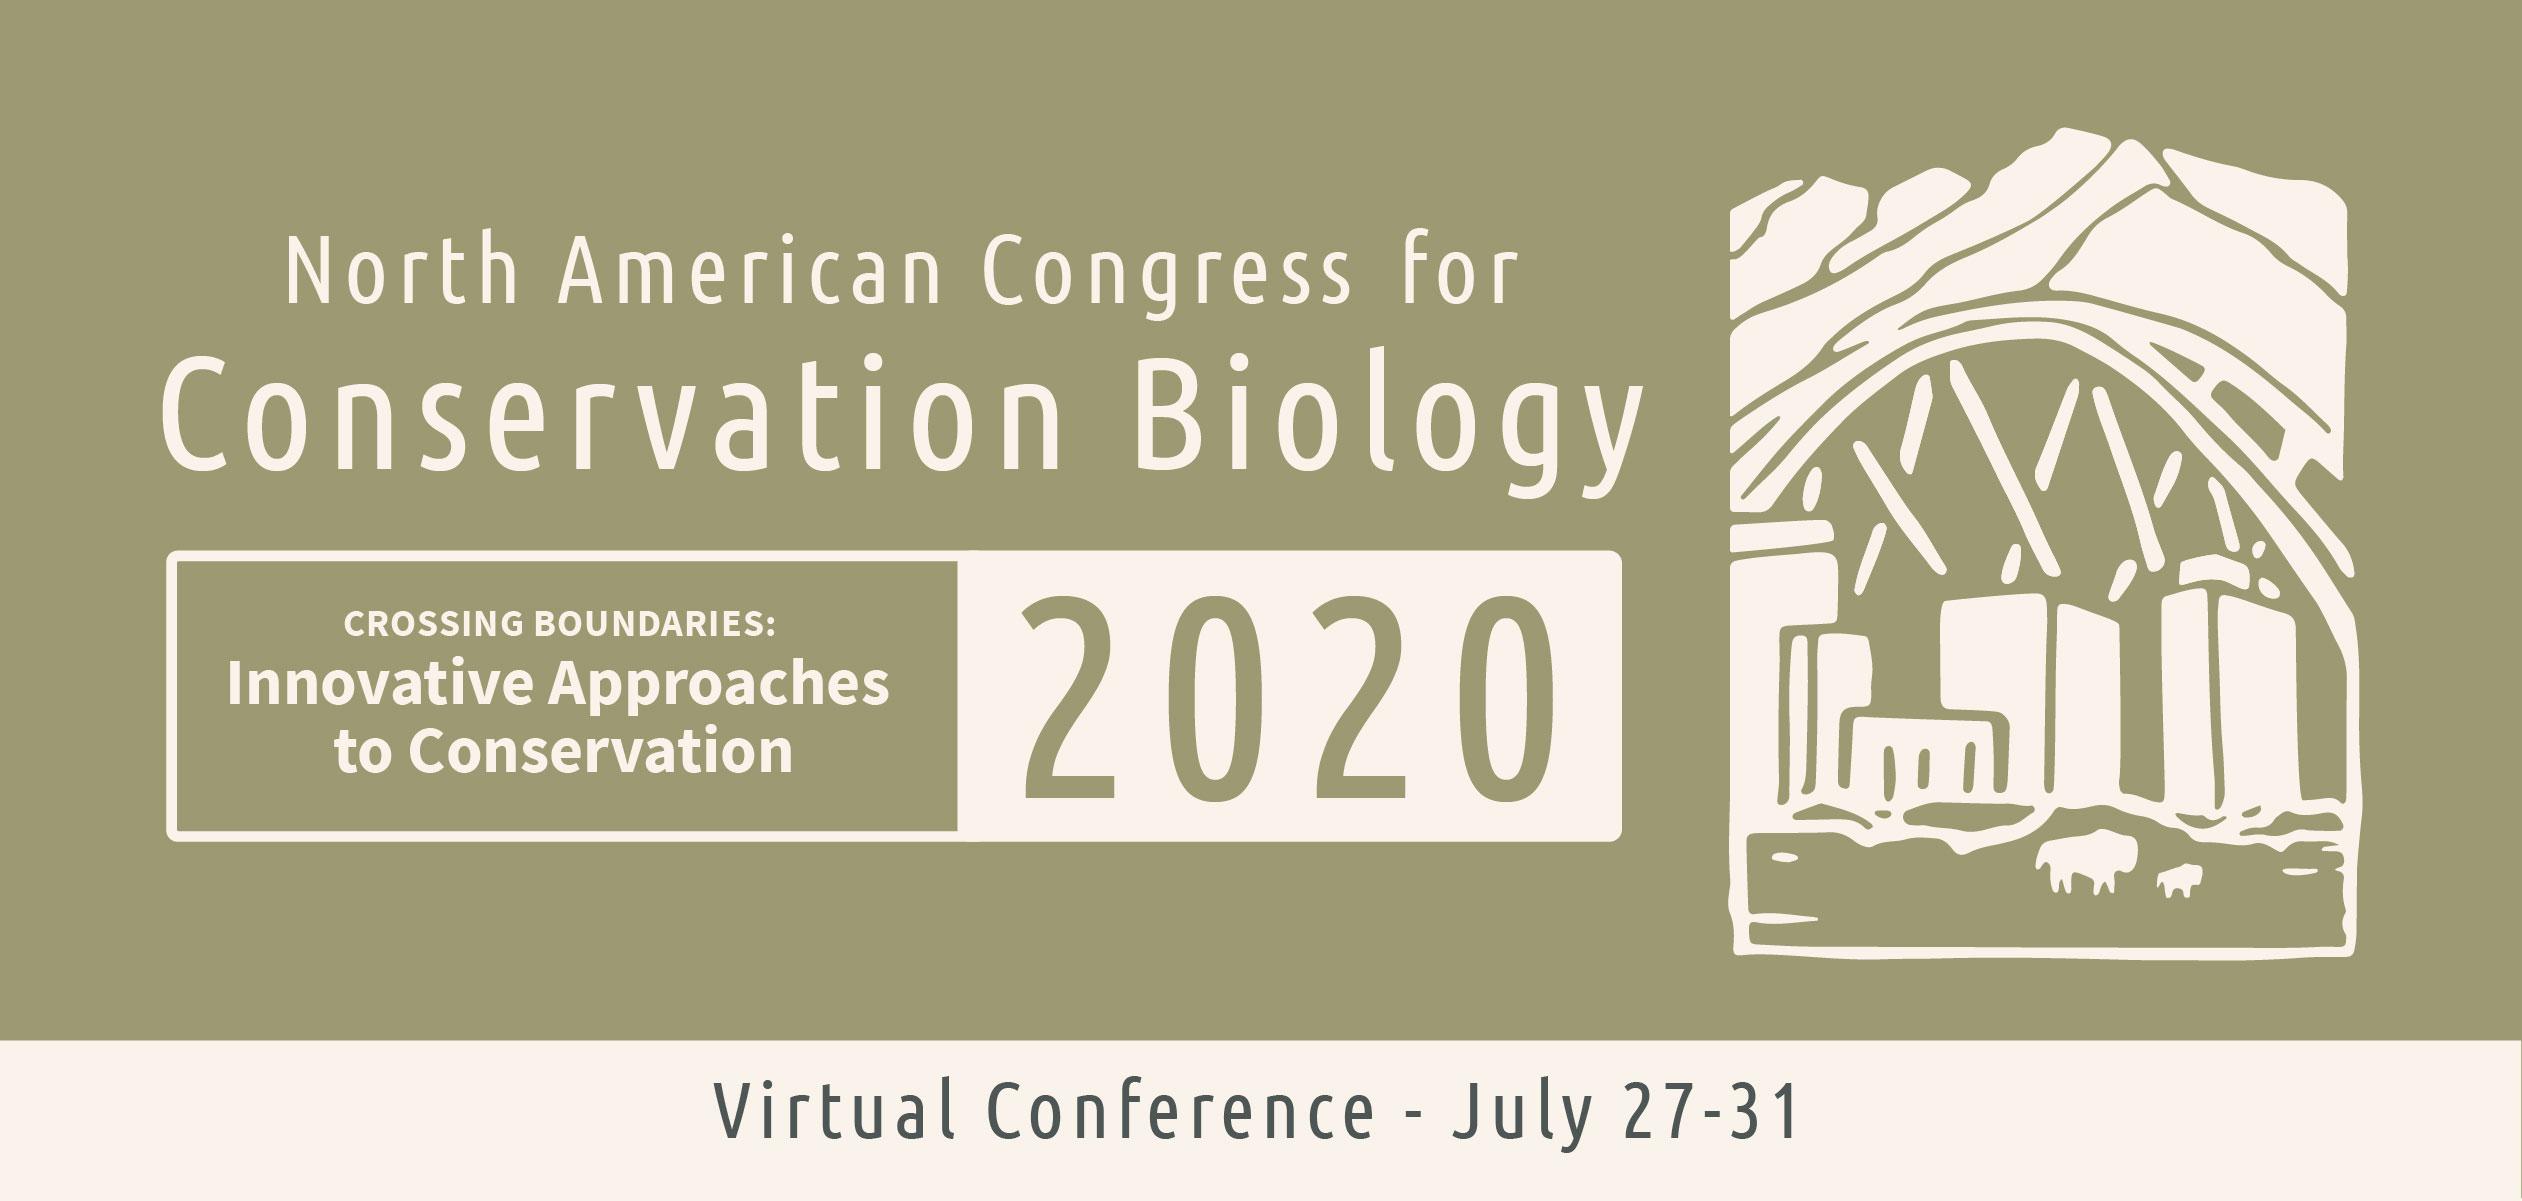 NACCB 2020 virtual web banner